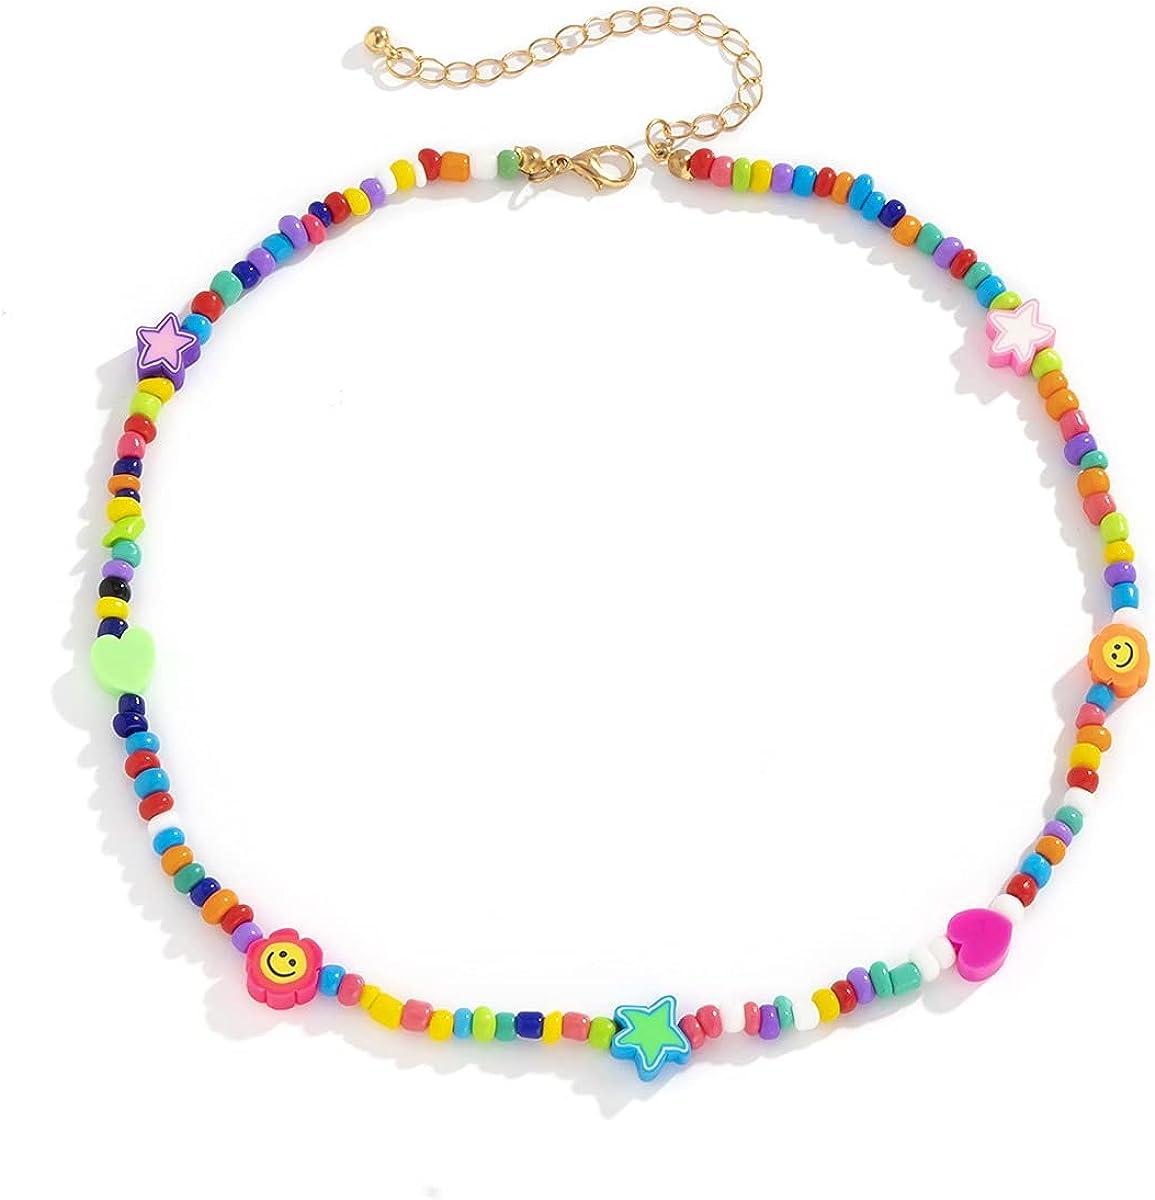 Boho Smiley SALENEW very popular Topics on TV Layered Beaded Necklaces Smile Strand with Bracelet